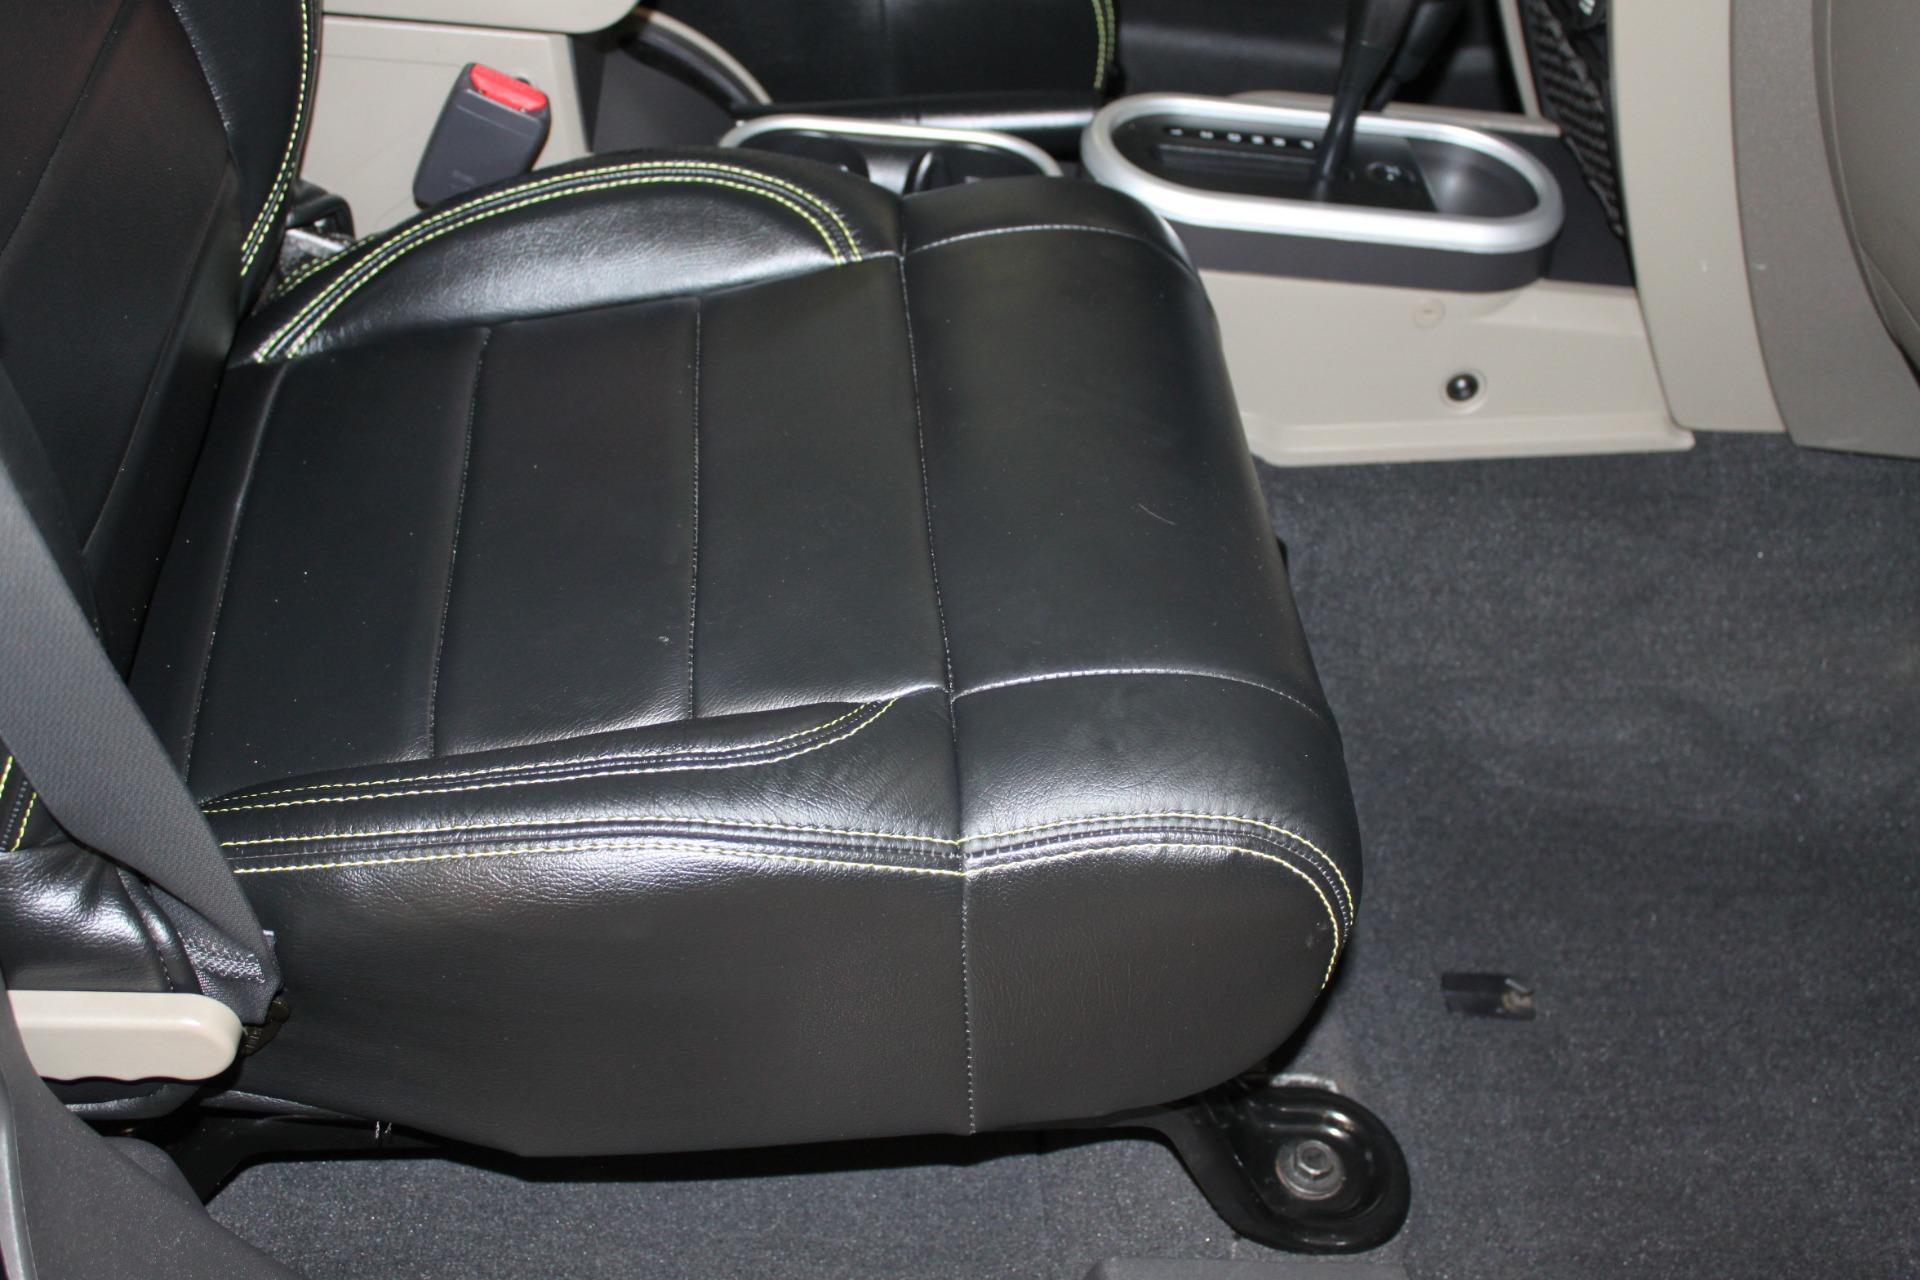 Used-2010-Jeep-Wrangler-Unlimited-Sahara-4X4-Wrangler